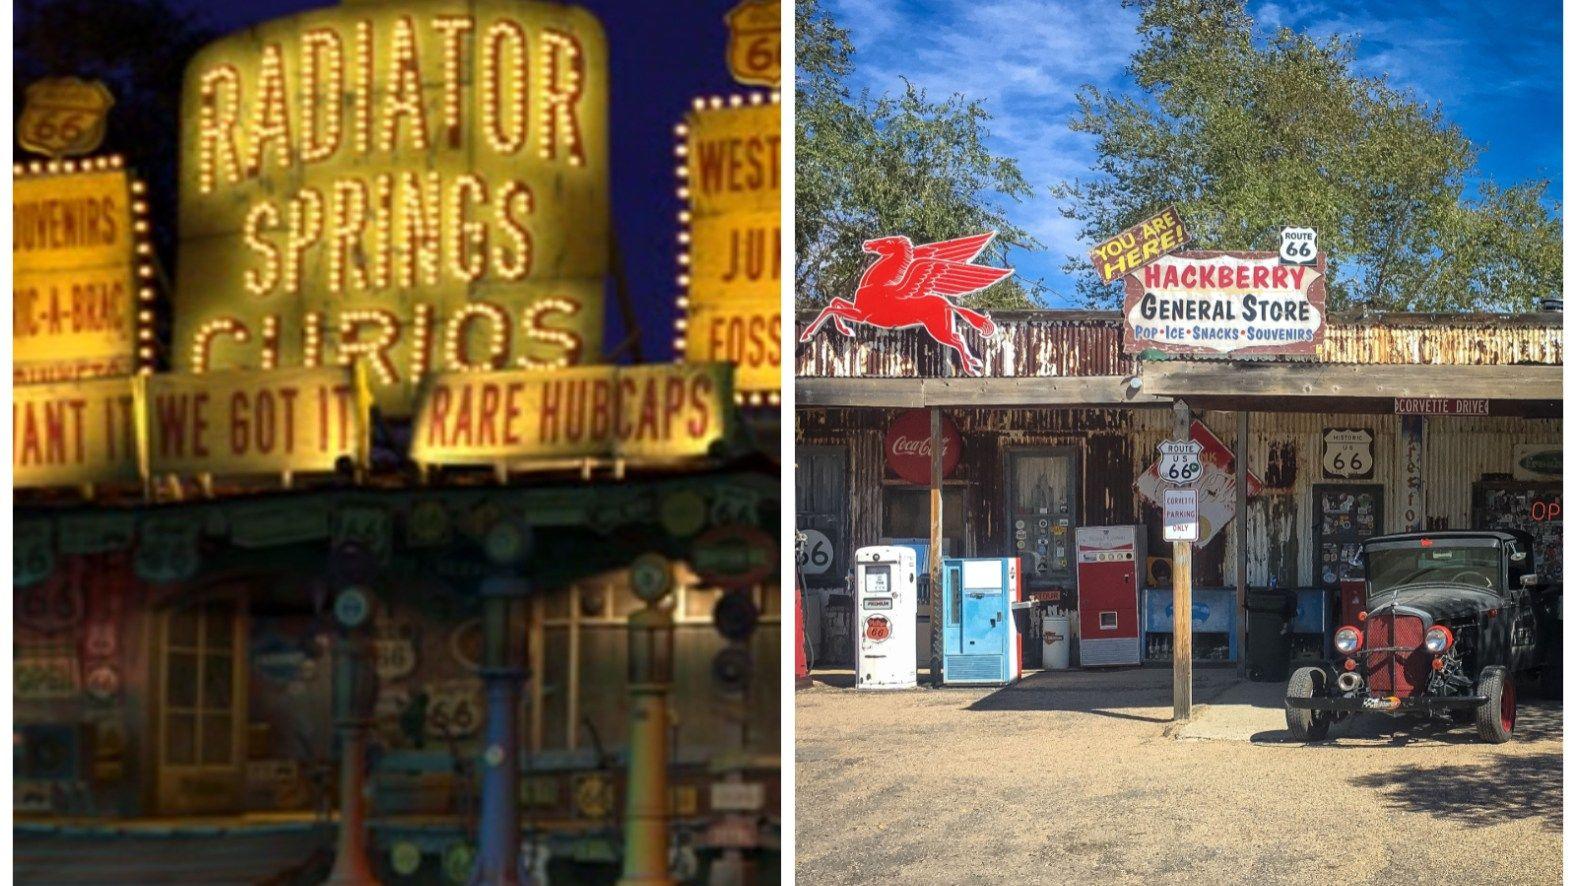 "<img src=""cars-lizzies.jpg"" alt=""Lizzie's Curio Shop / Hackberry General Store"">"